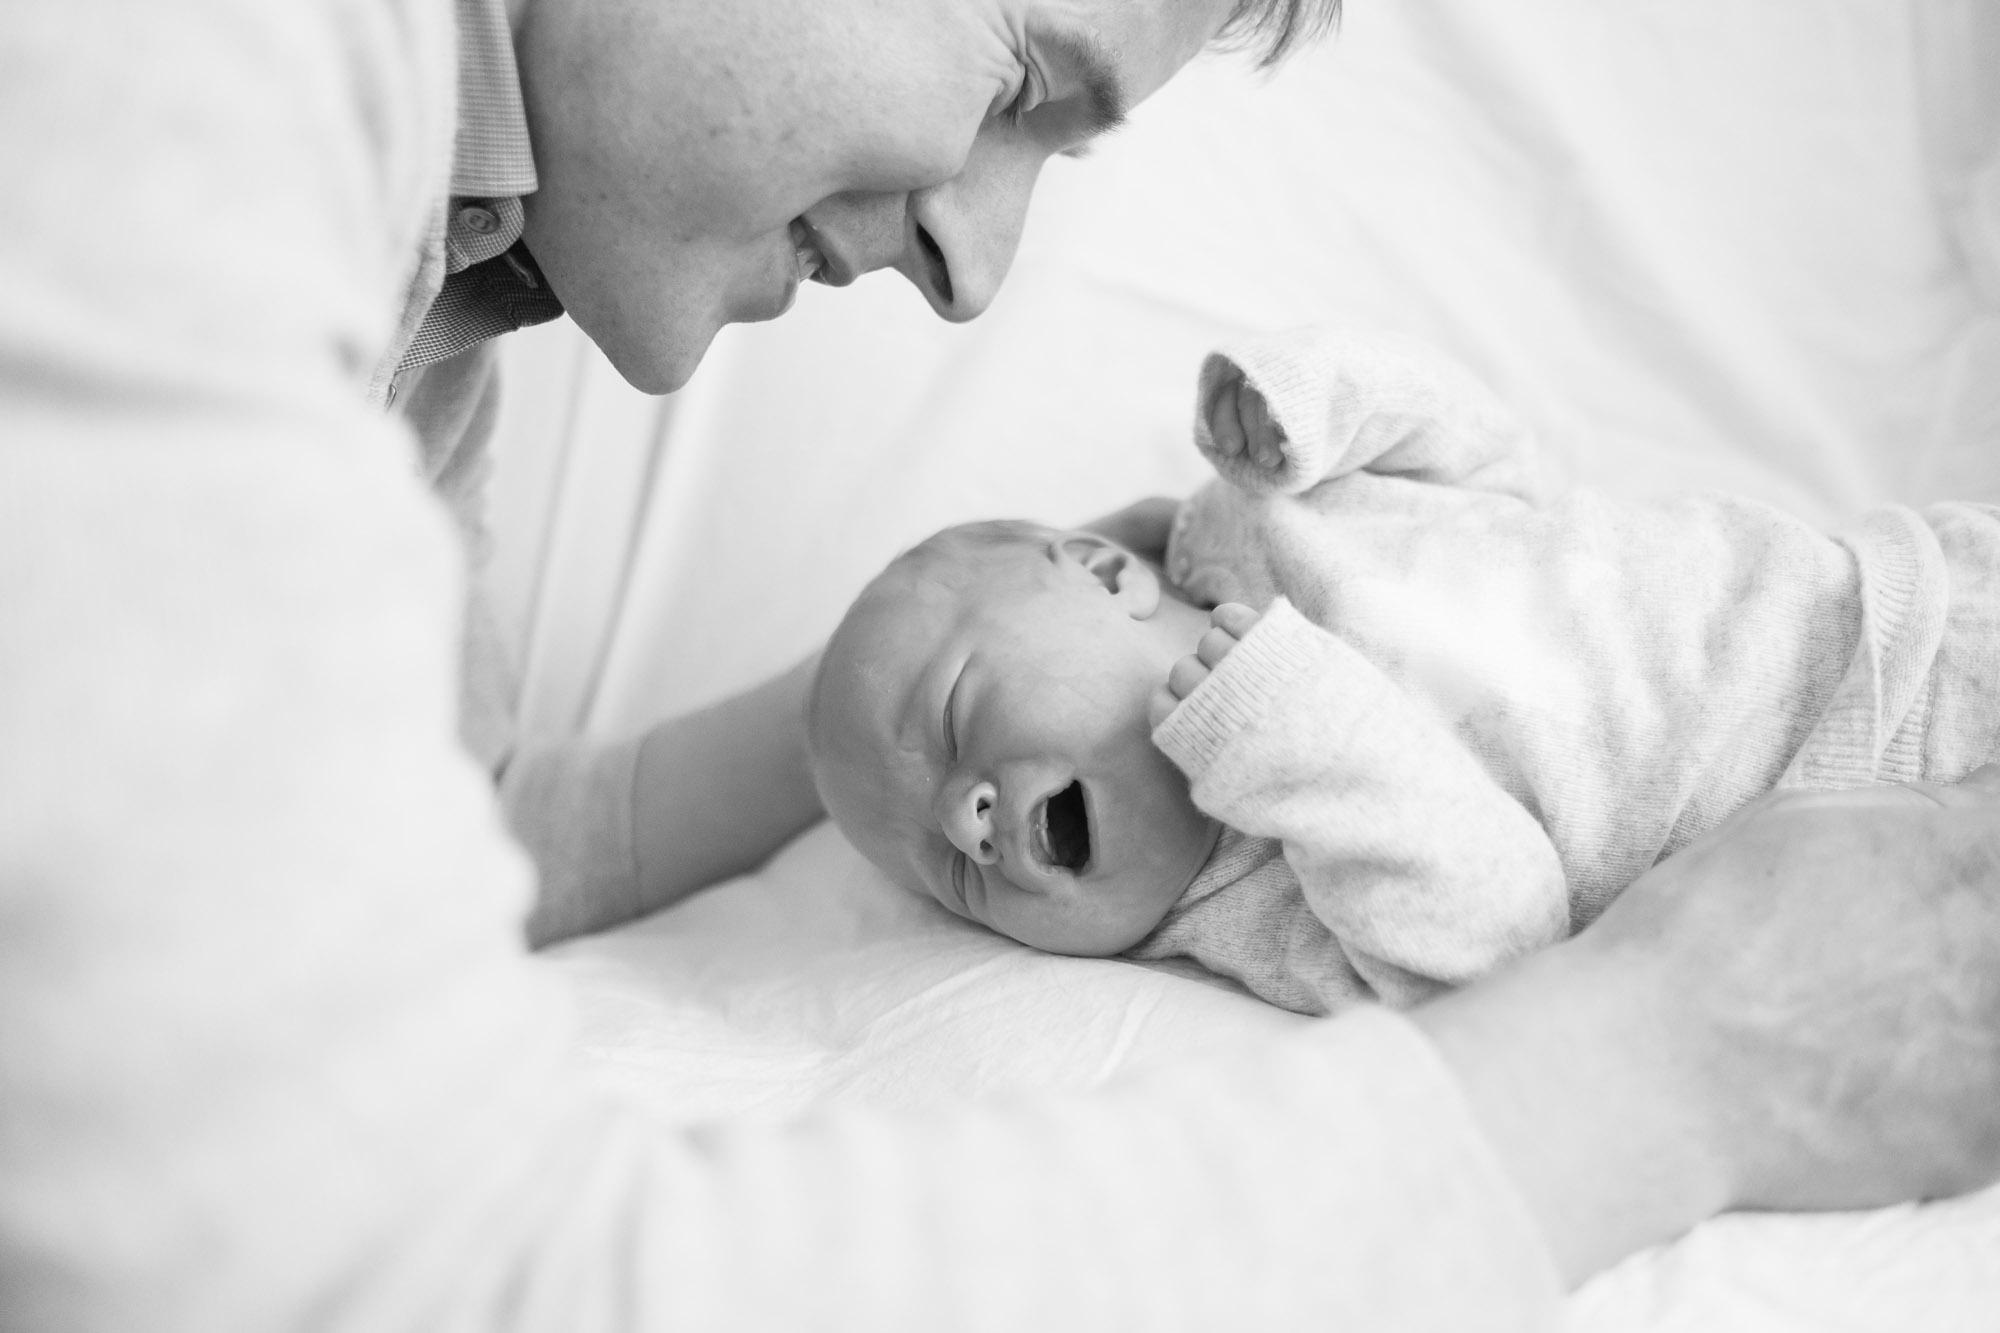 newborn-baby-family-portrait-photographer-137.jpg